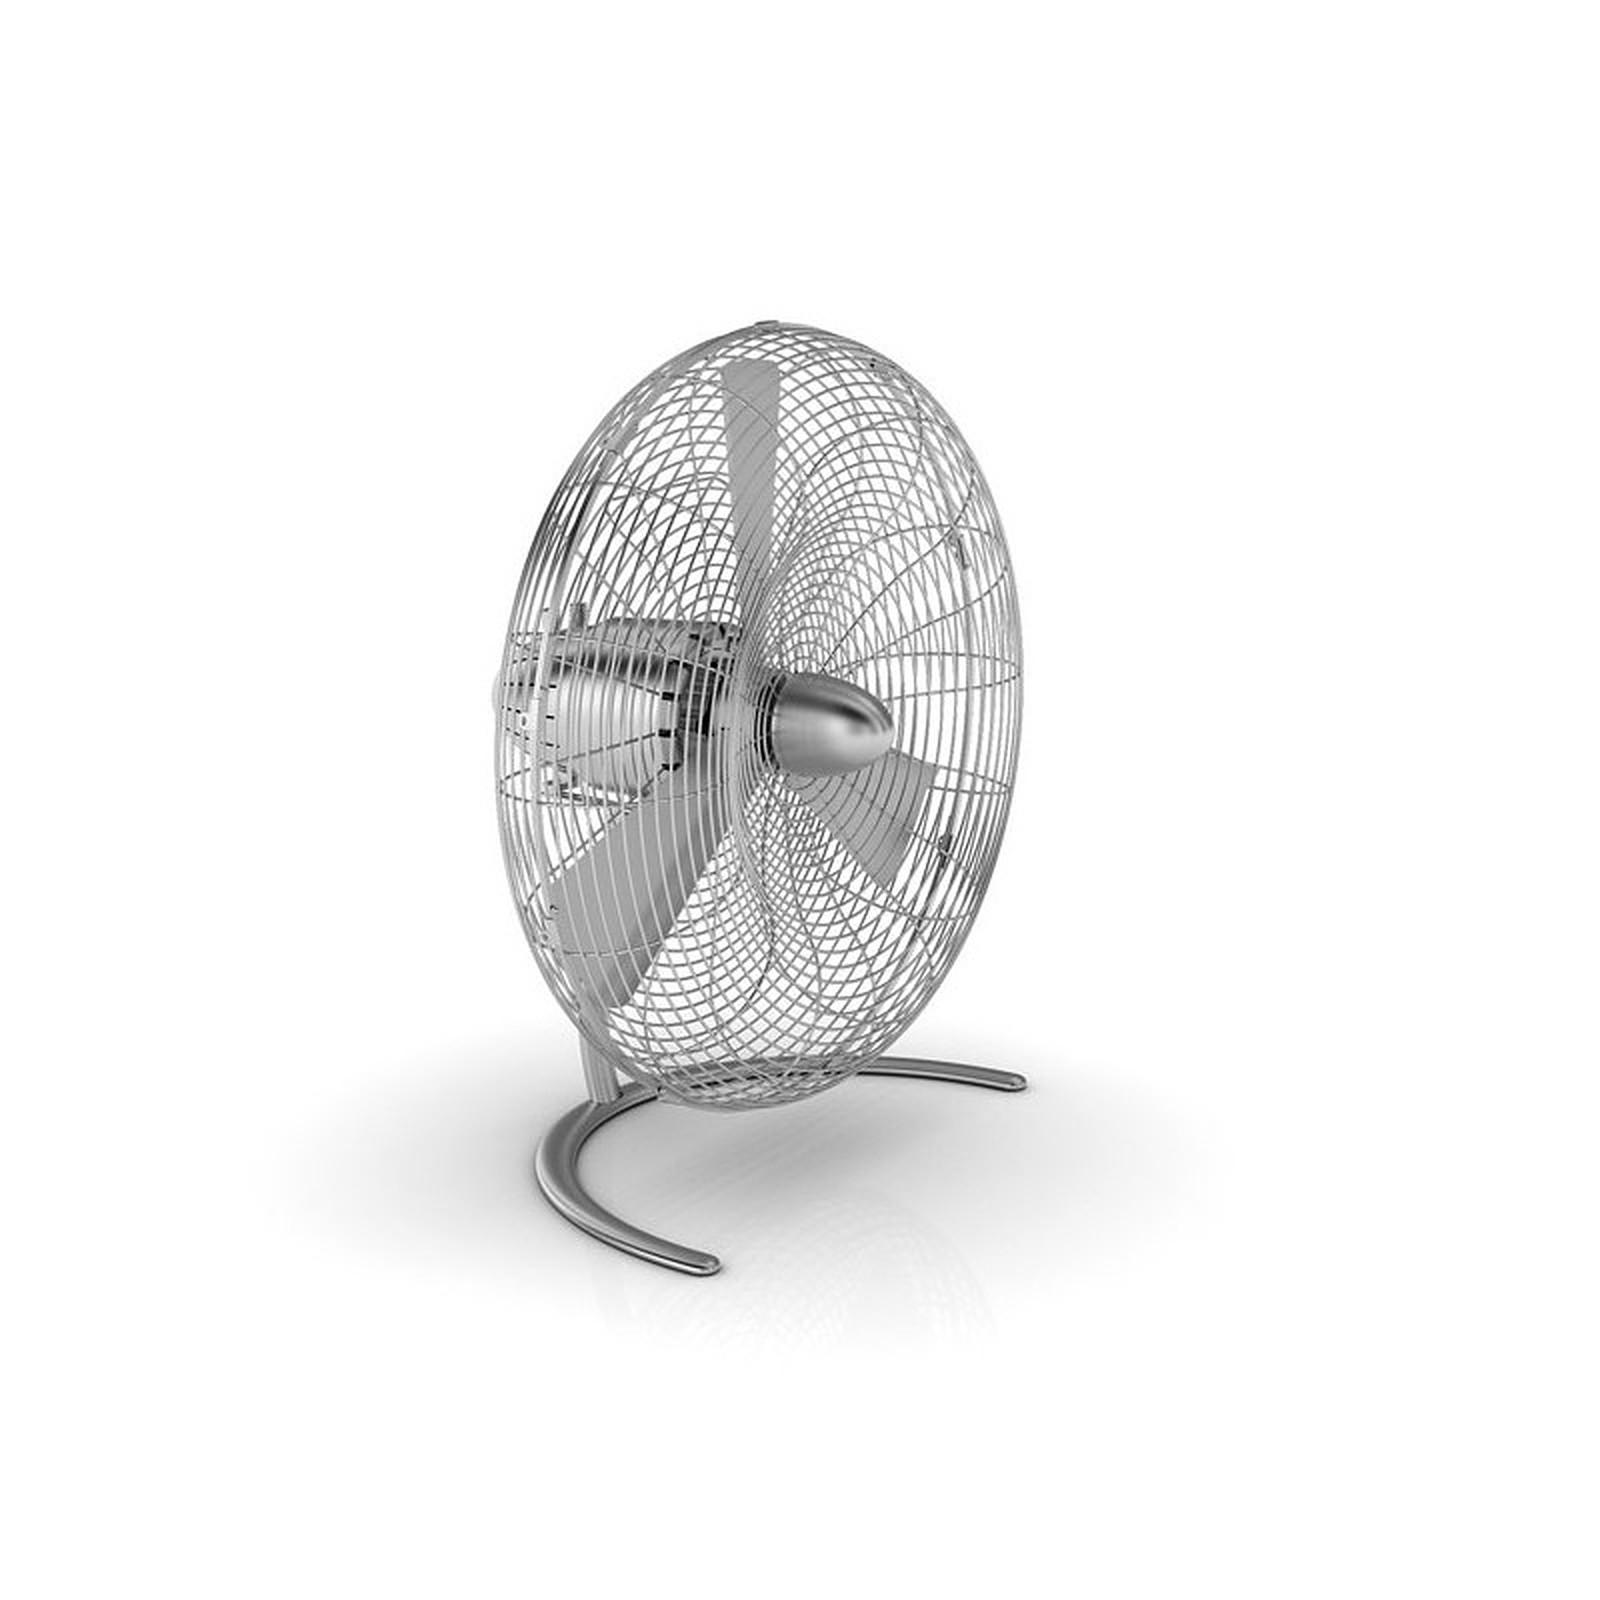 StadlerForm - Ventilateur CHARLY Floor - Acier inox